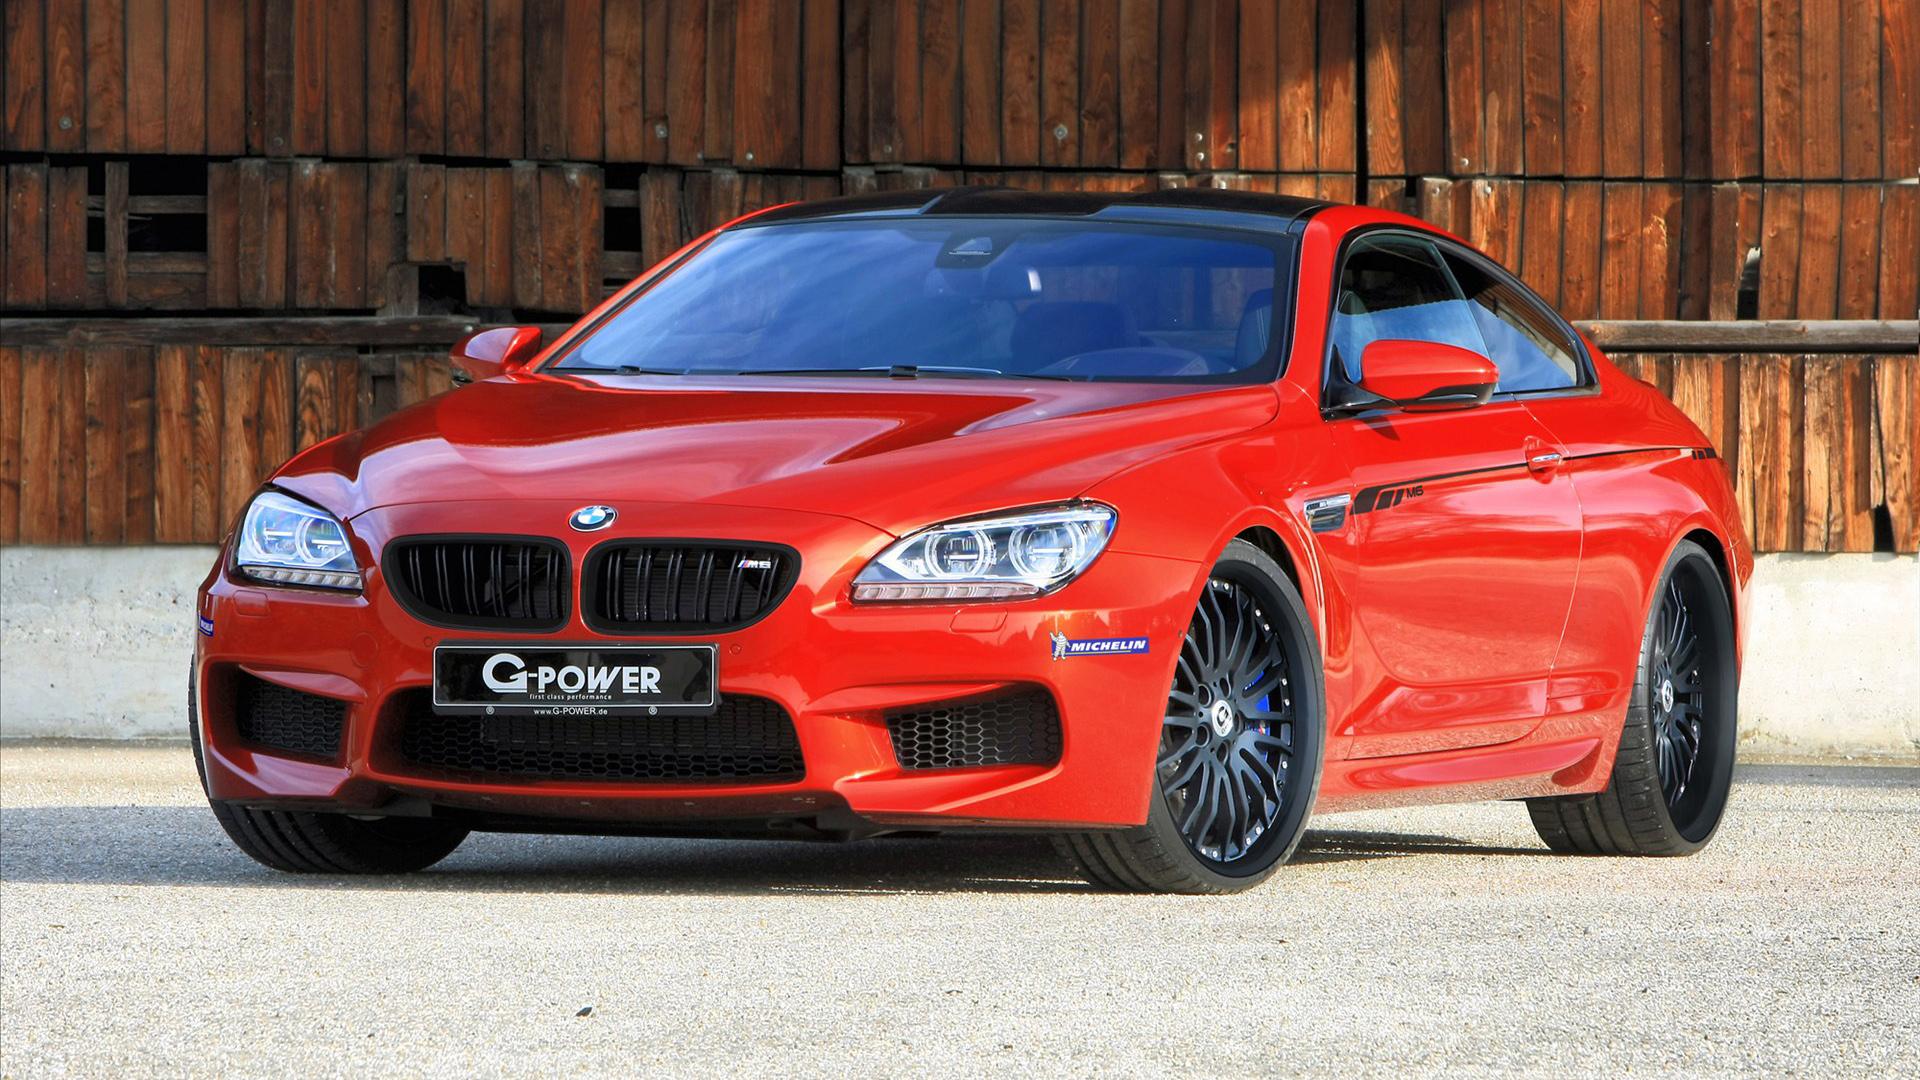 G Power M F13 Refined BMW M6 Wallpaper | HD Car Wallpapers ...